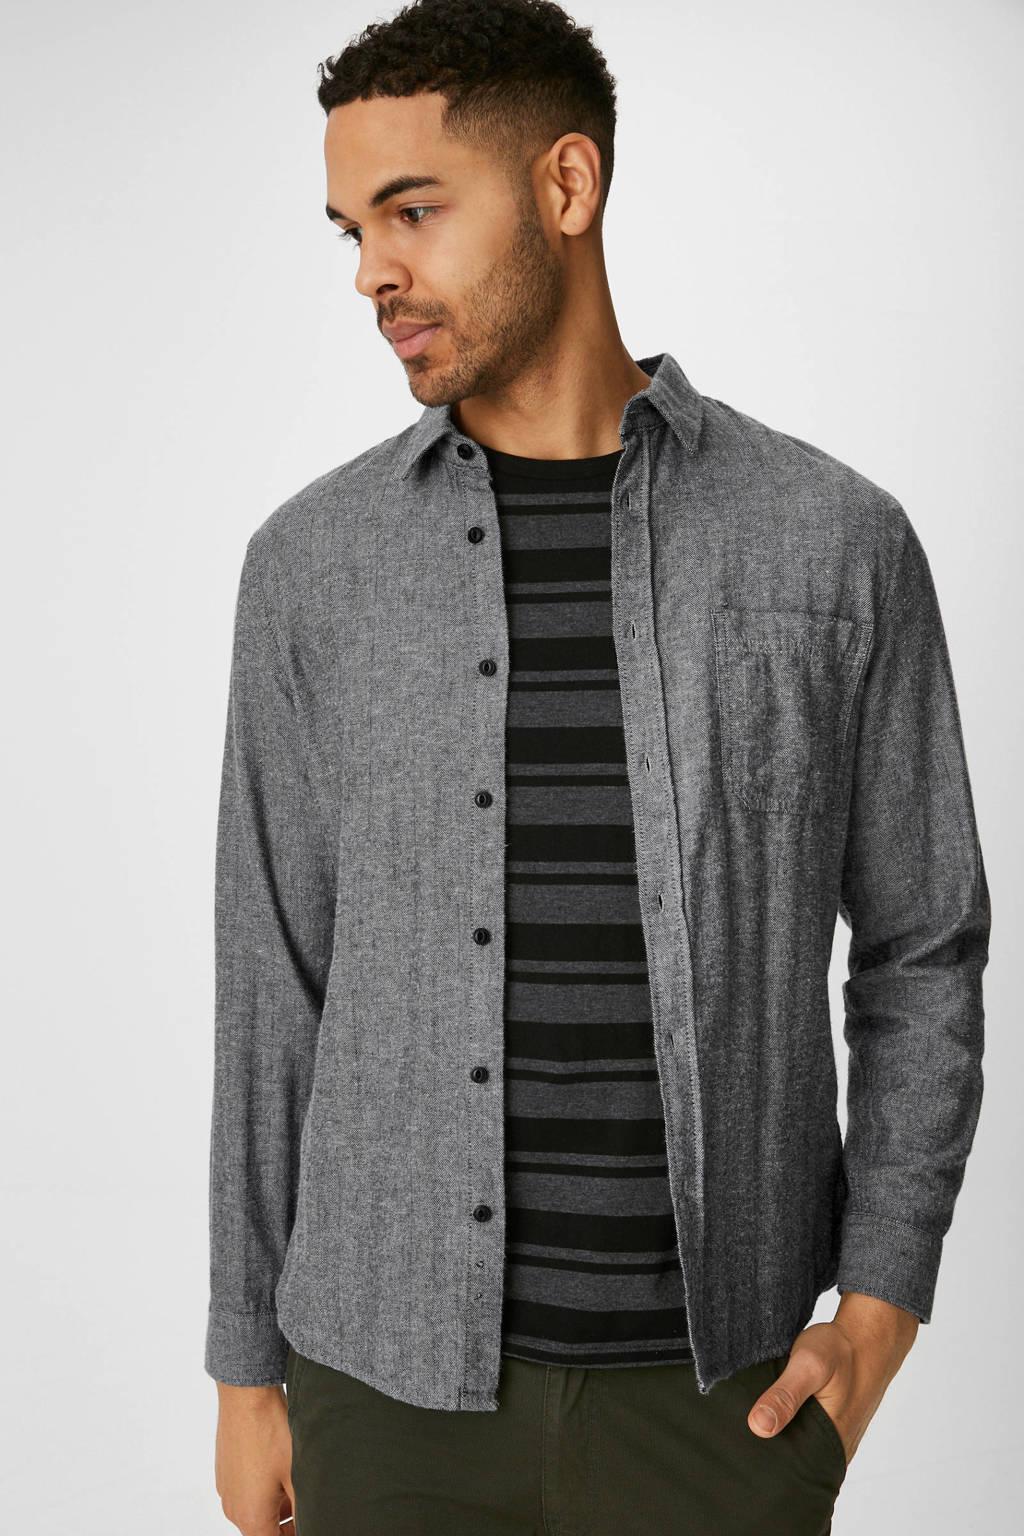 C&A Angelo Litrico slim fit overhemd grijs, Grijs